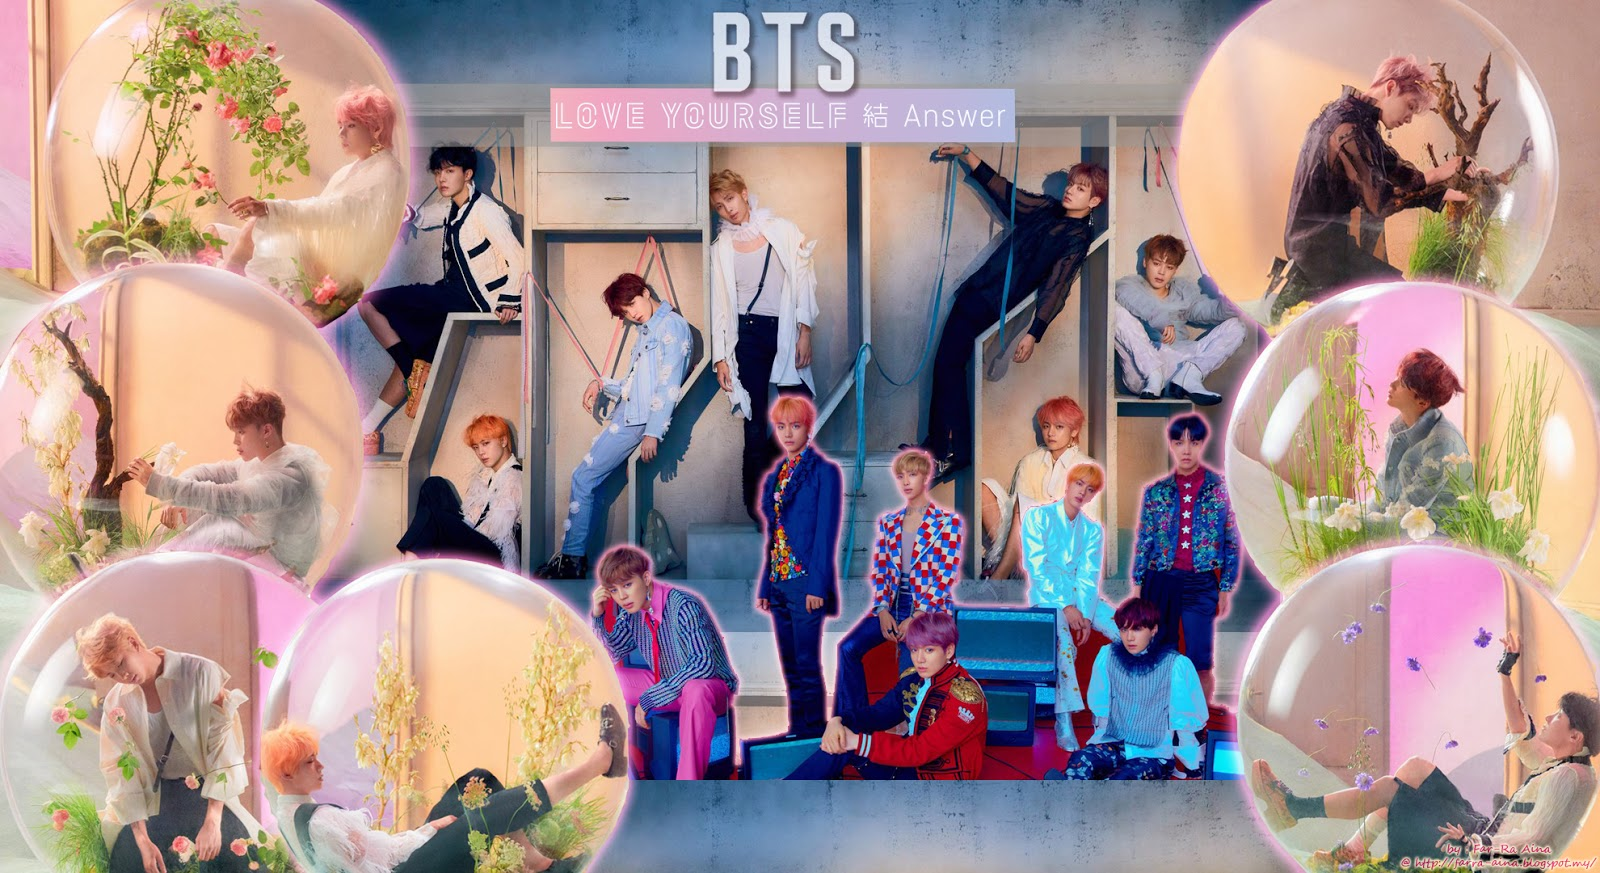 K Pop Lover Bts Love Yourself 結 Answer Wallpaper